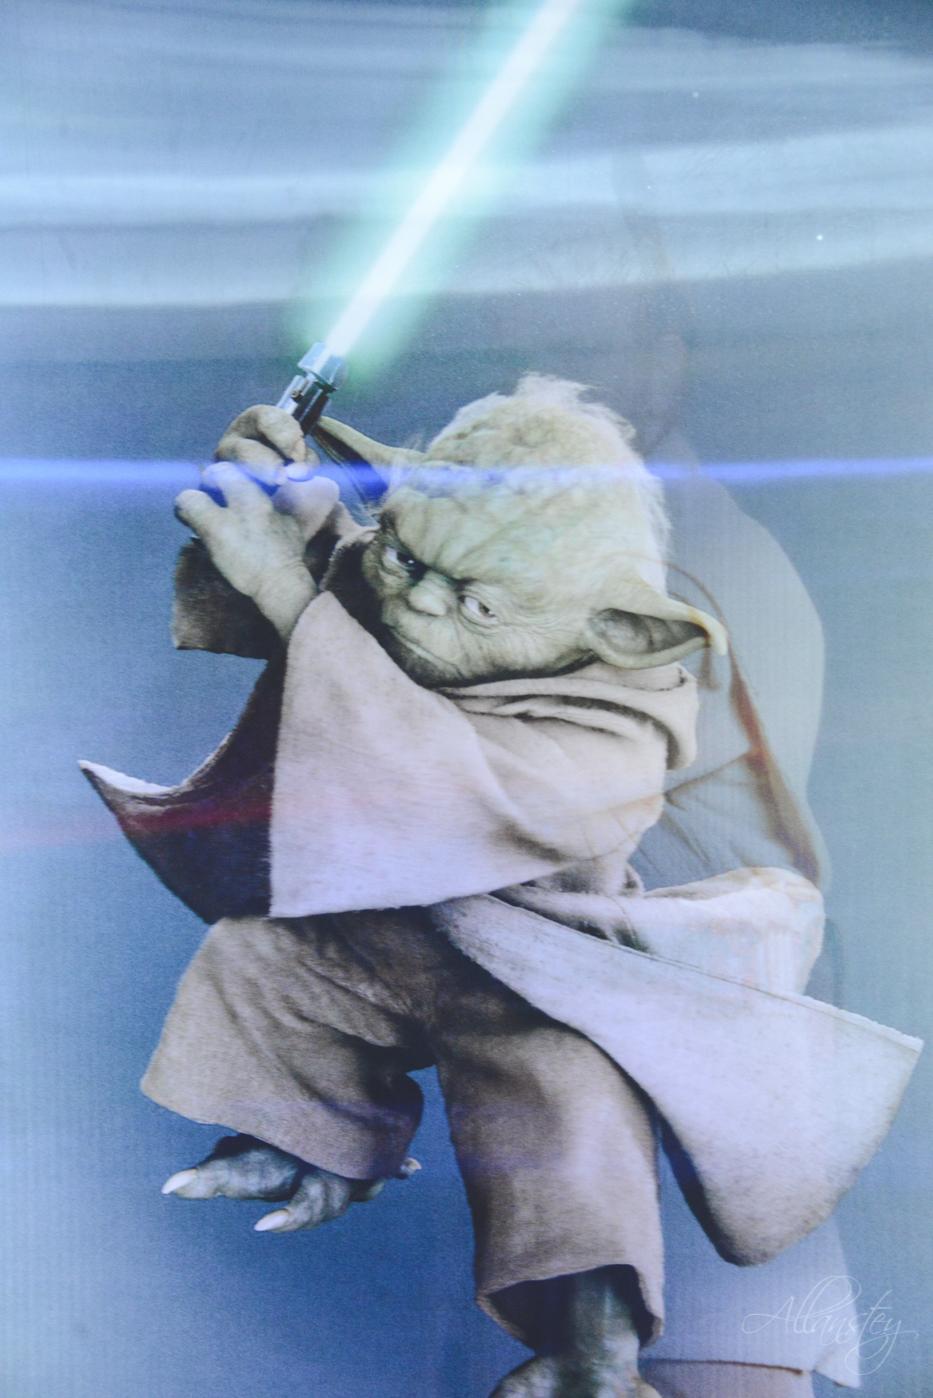 Yoda Star Wars in Detsky Mir shop